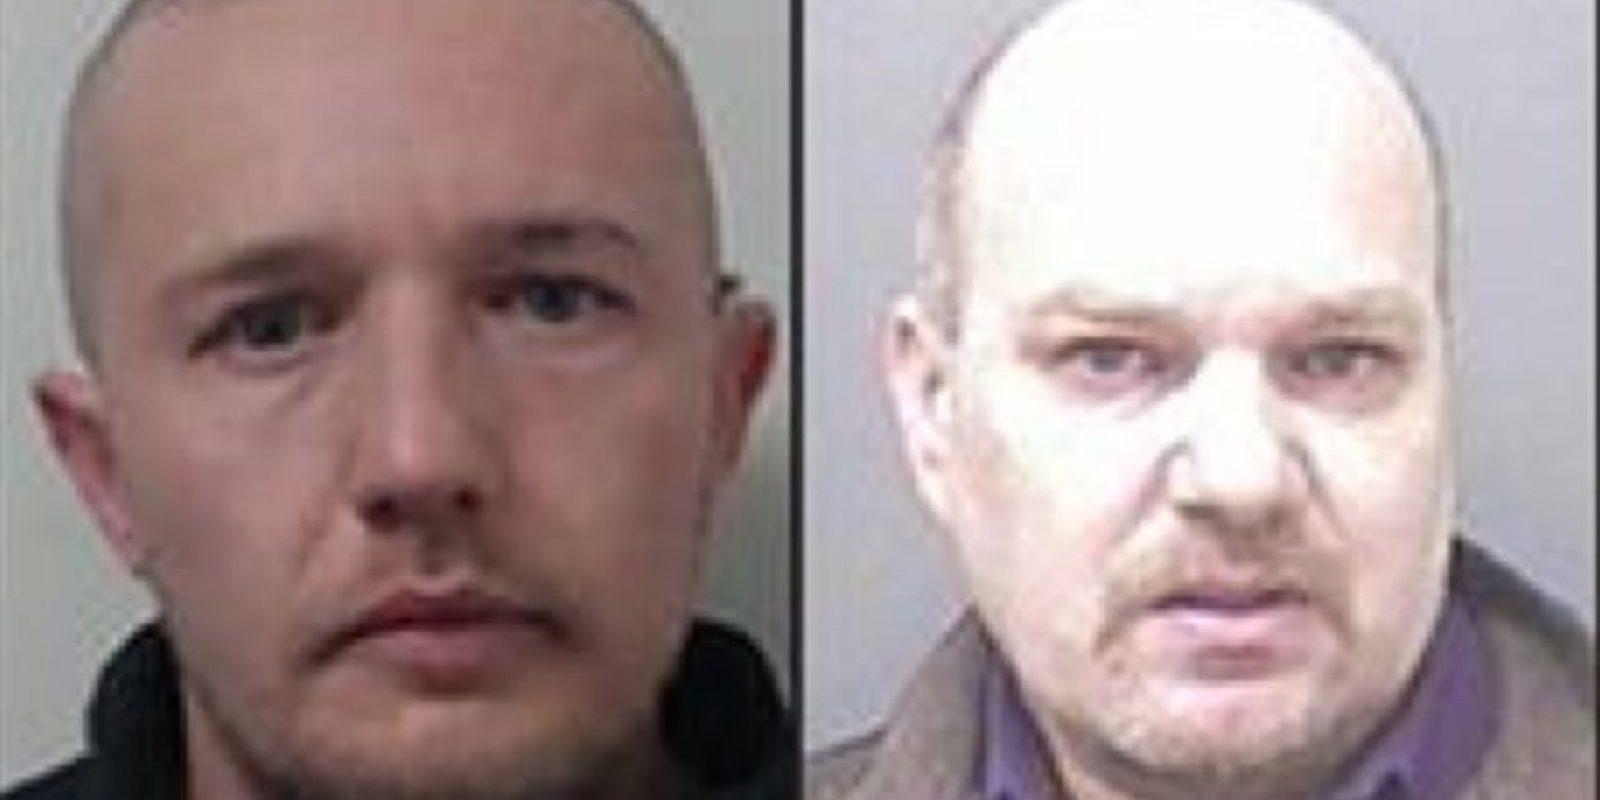 De Izquierda a derecha: Chris Knight 35, David Harsley 51 Foto:Vía www.nationalcrimeagency.gov.uk